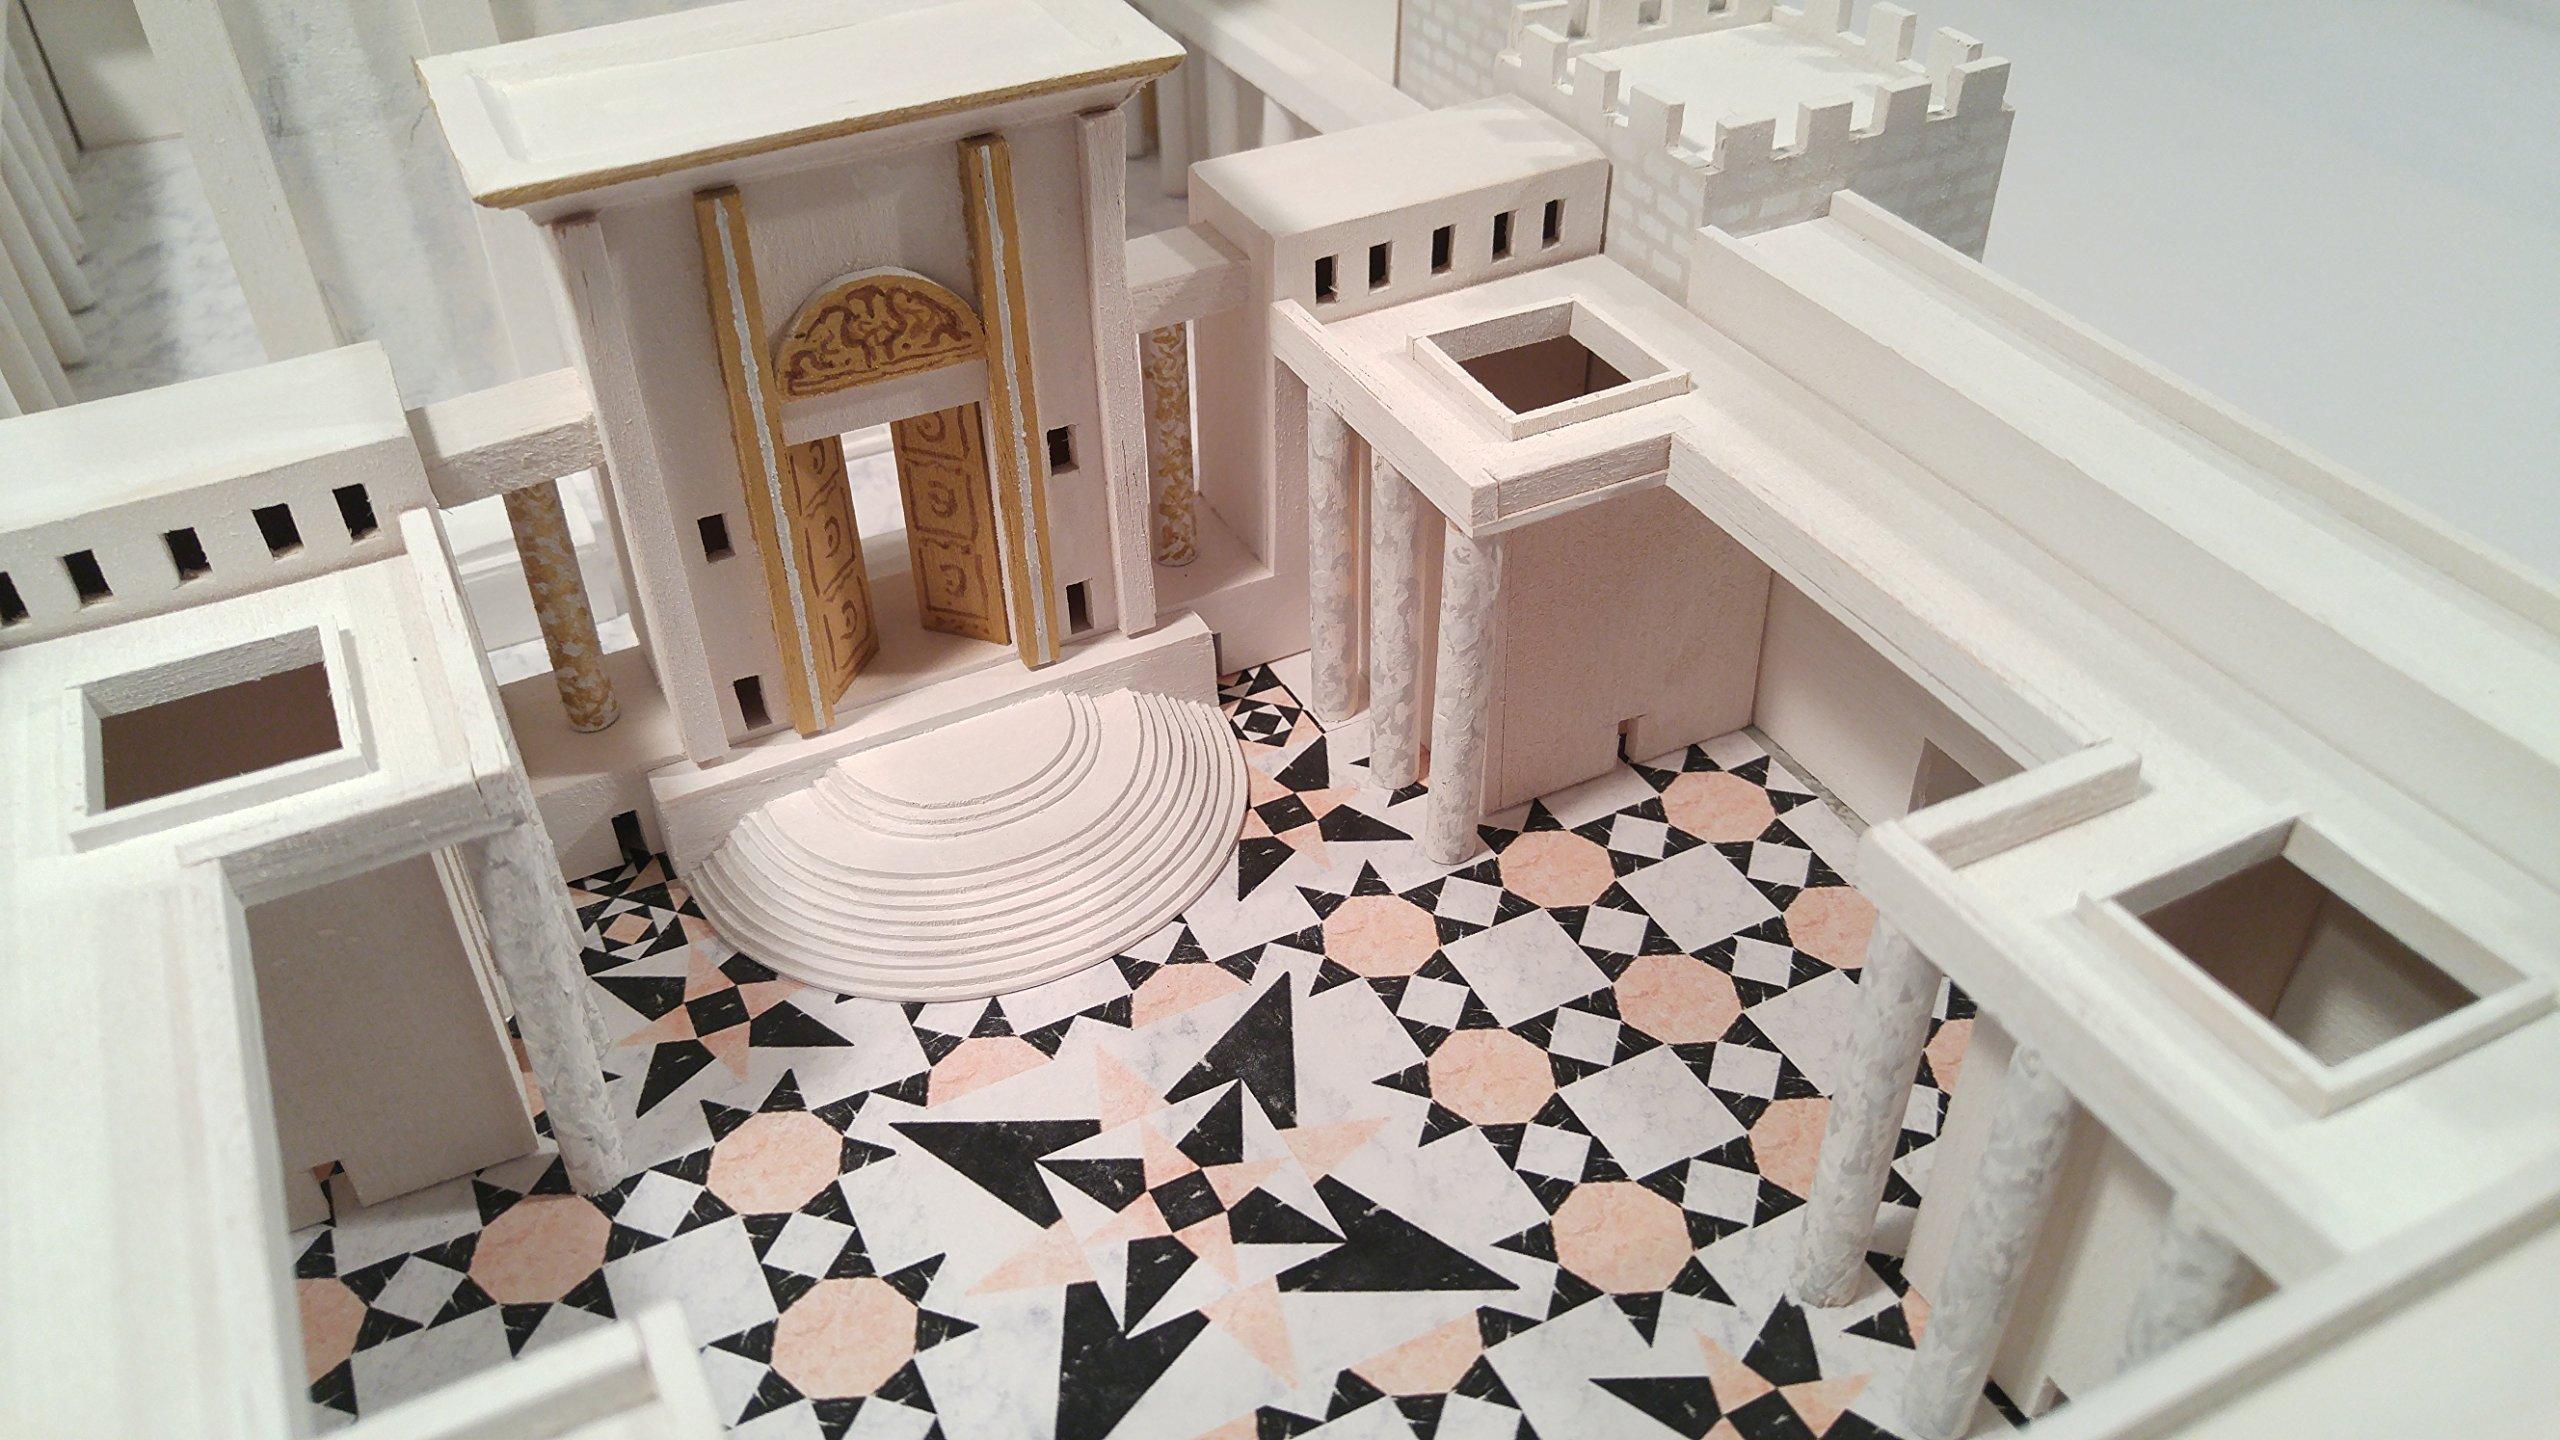 Jerusalem Second Temple Model Kit (Do-it-Yourself) - Beit HaMikdash